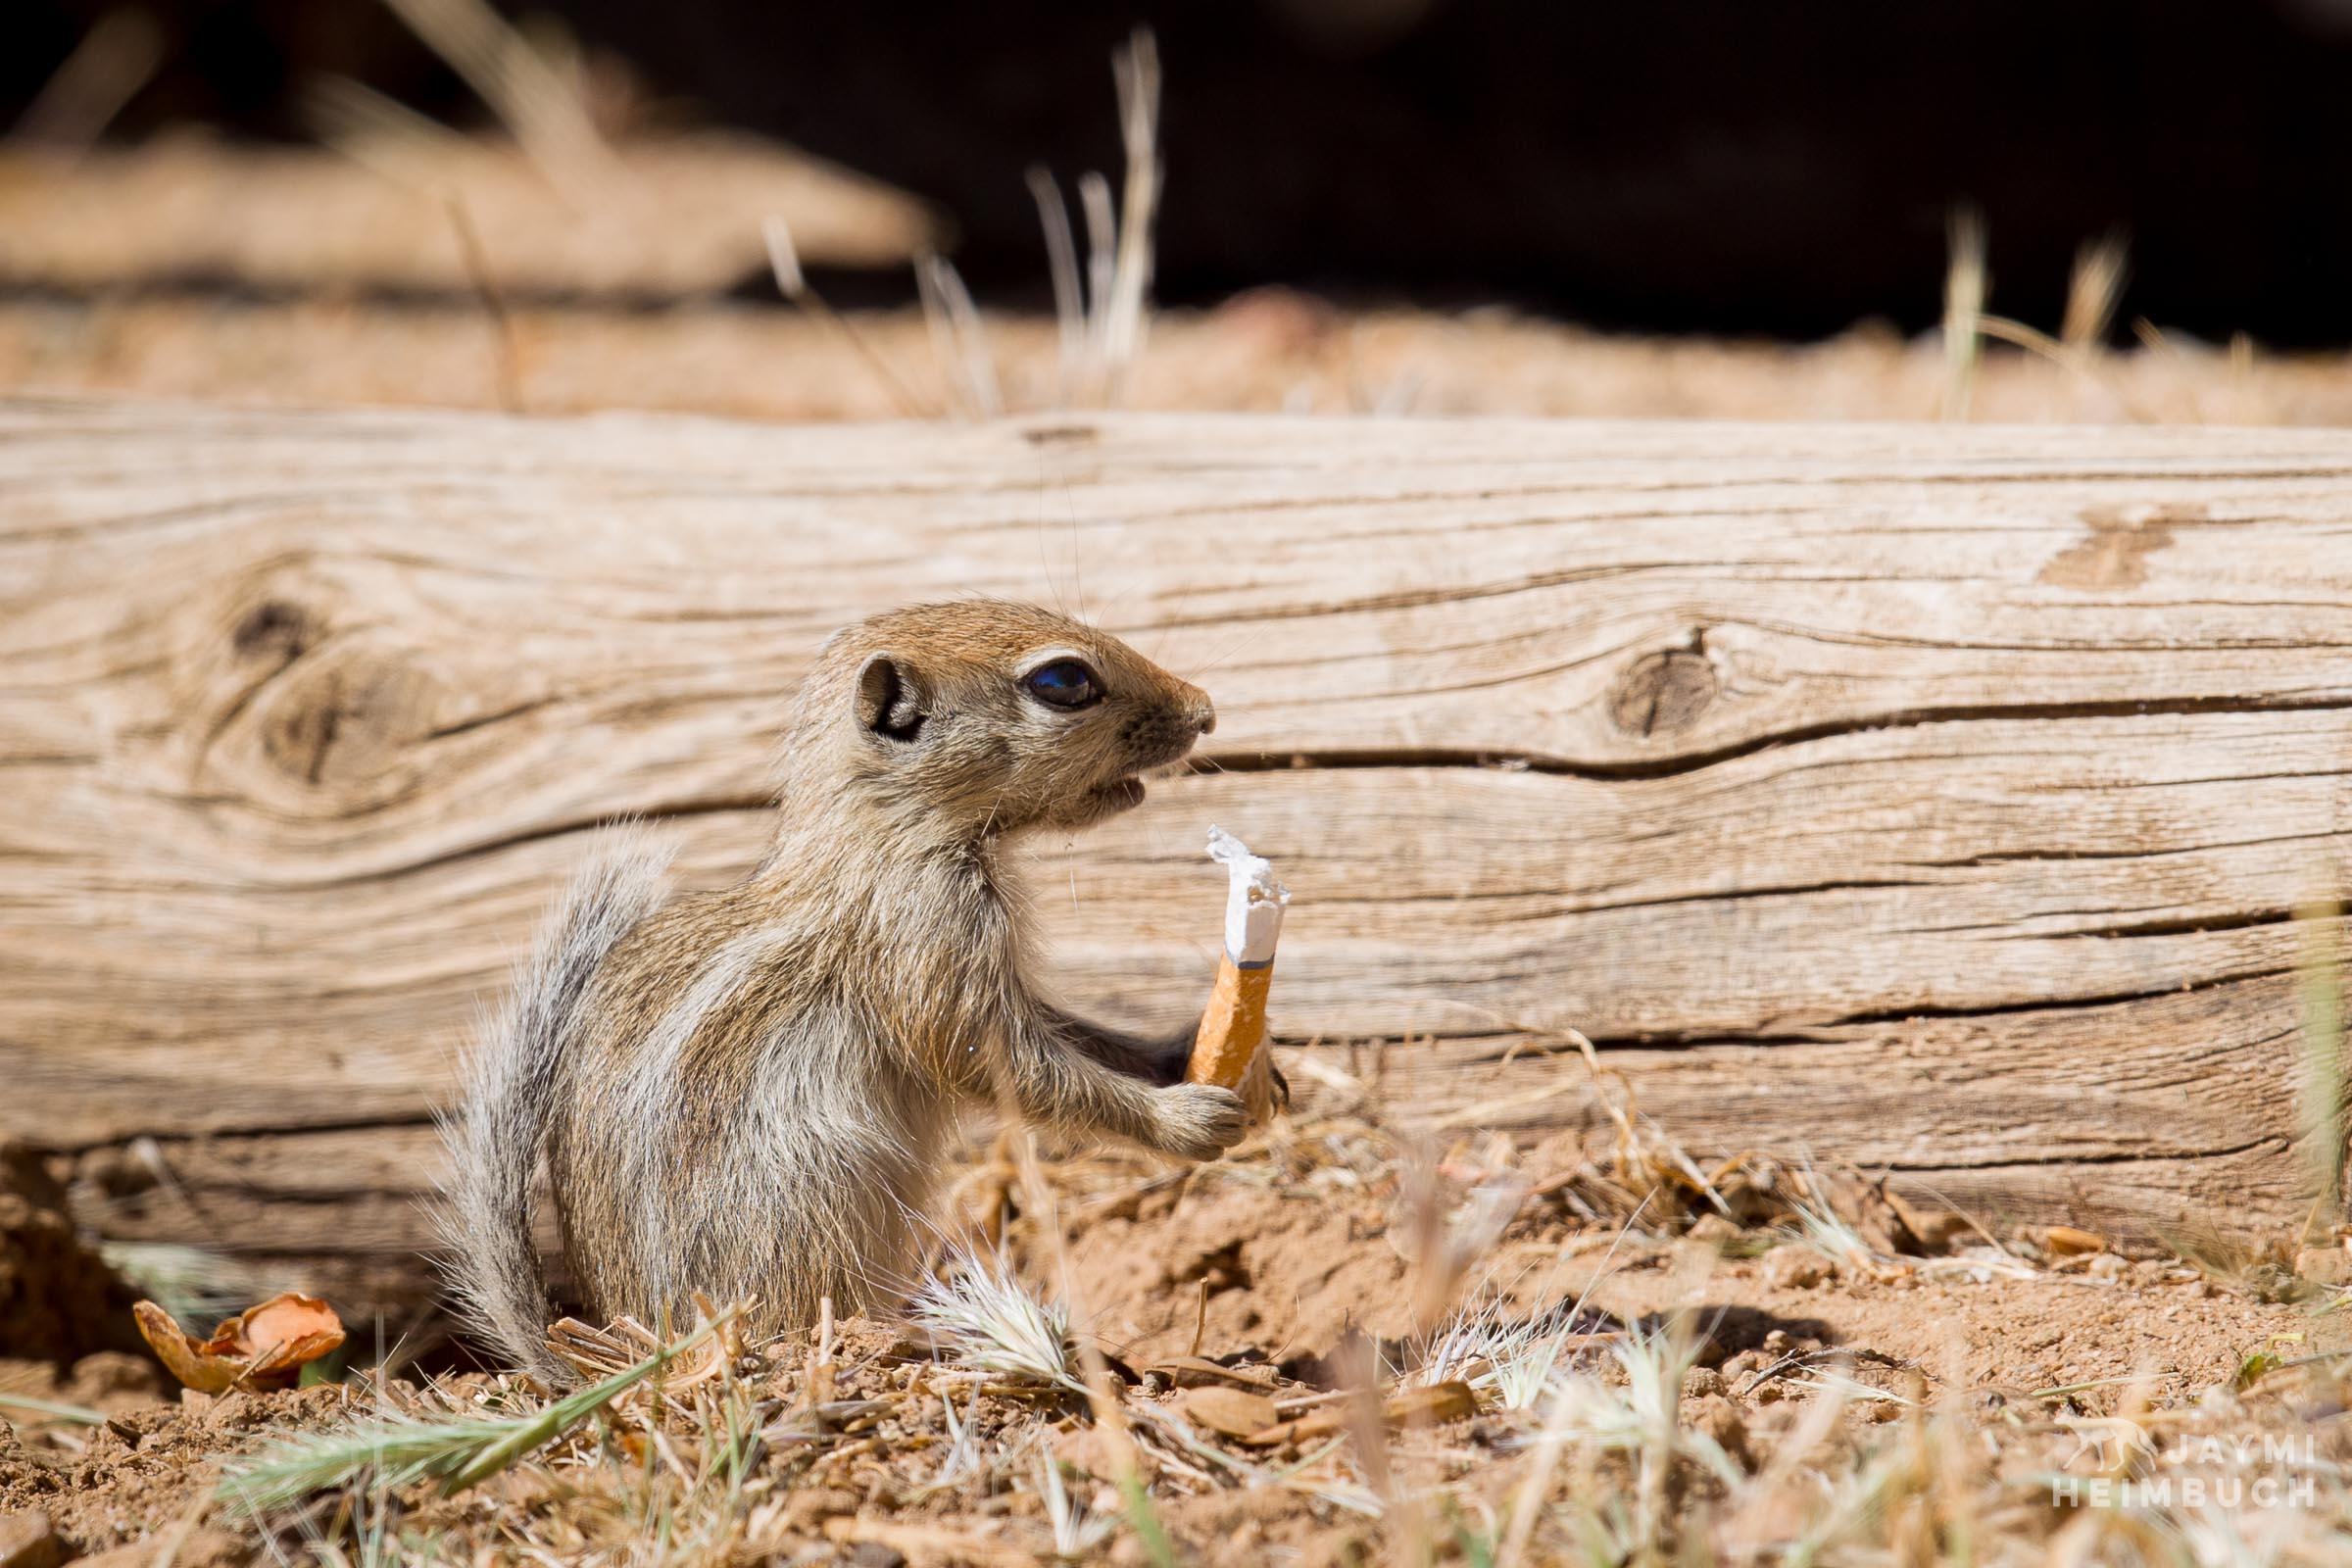 San Juaquin antelope squirrel with cigarette